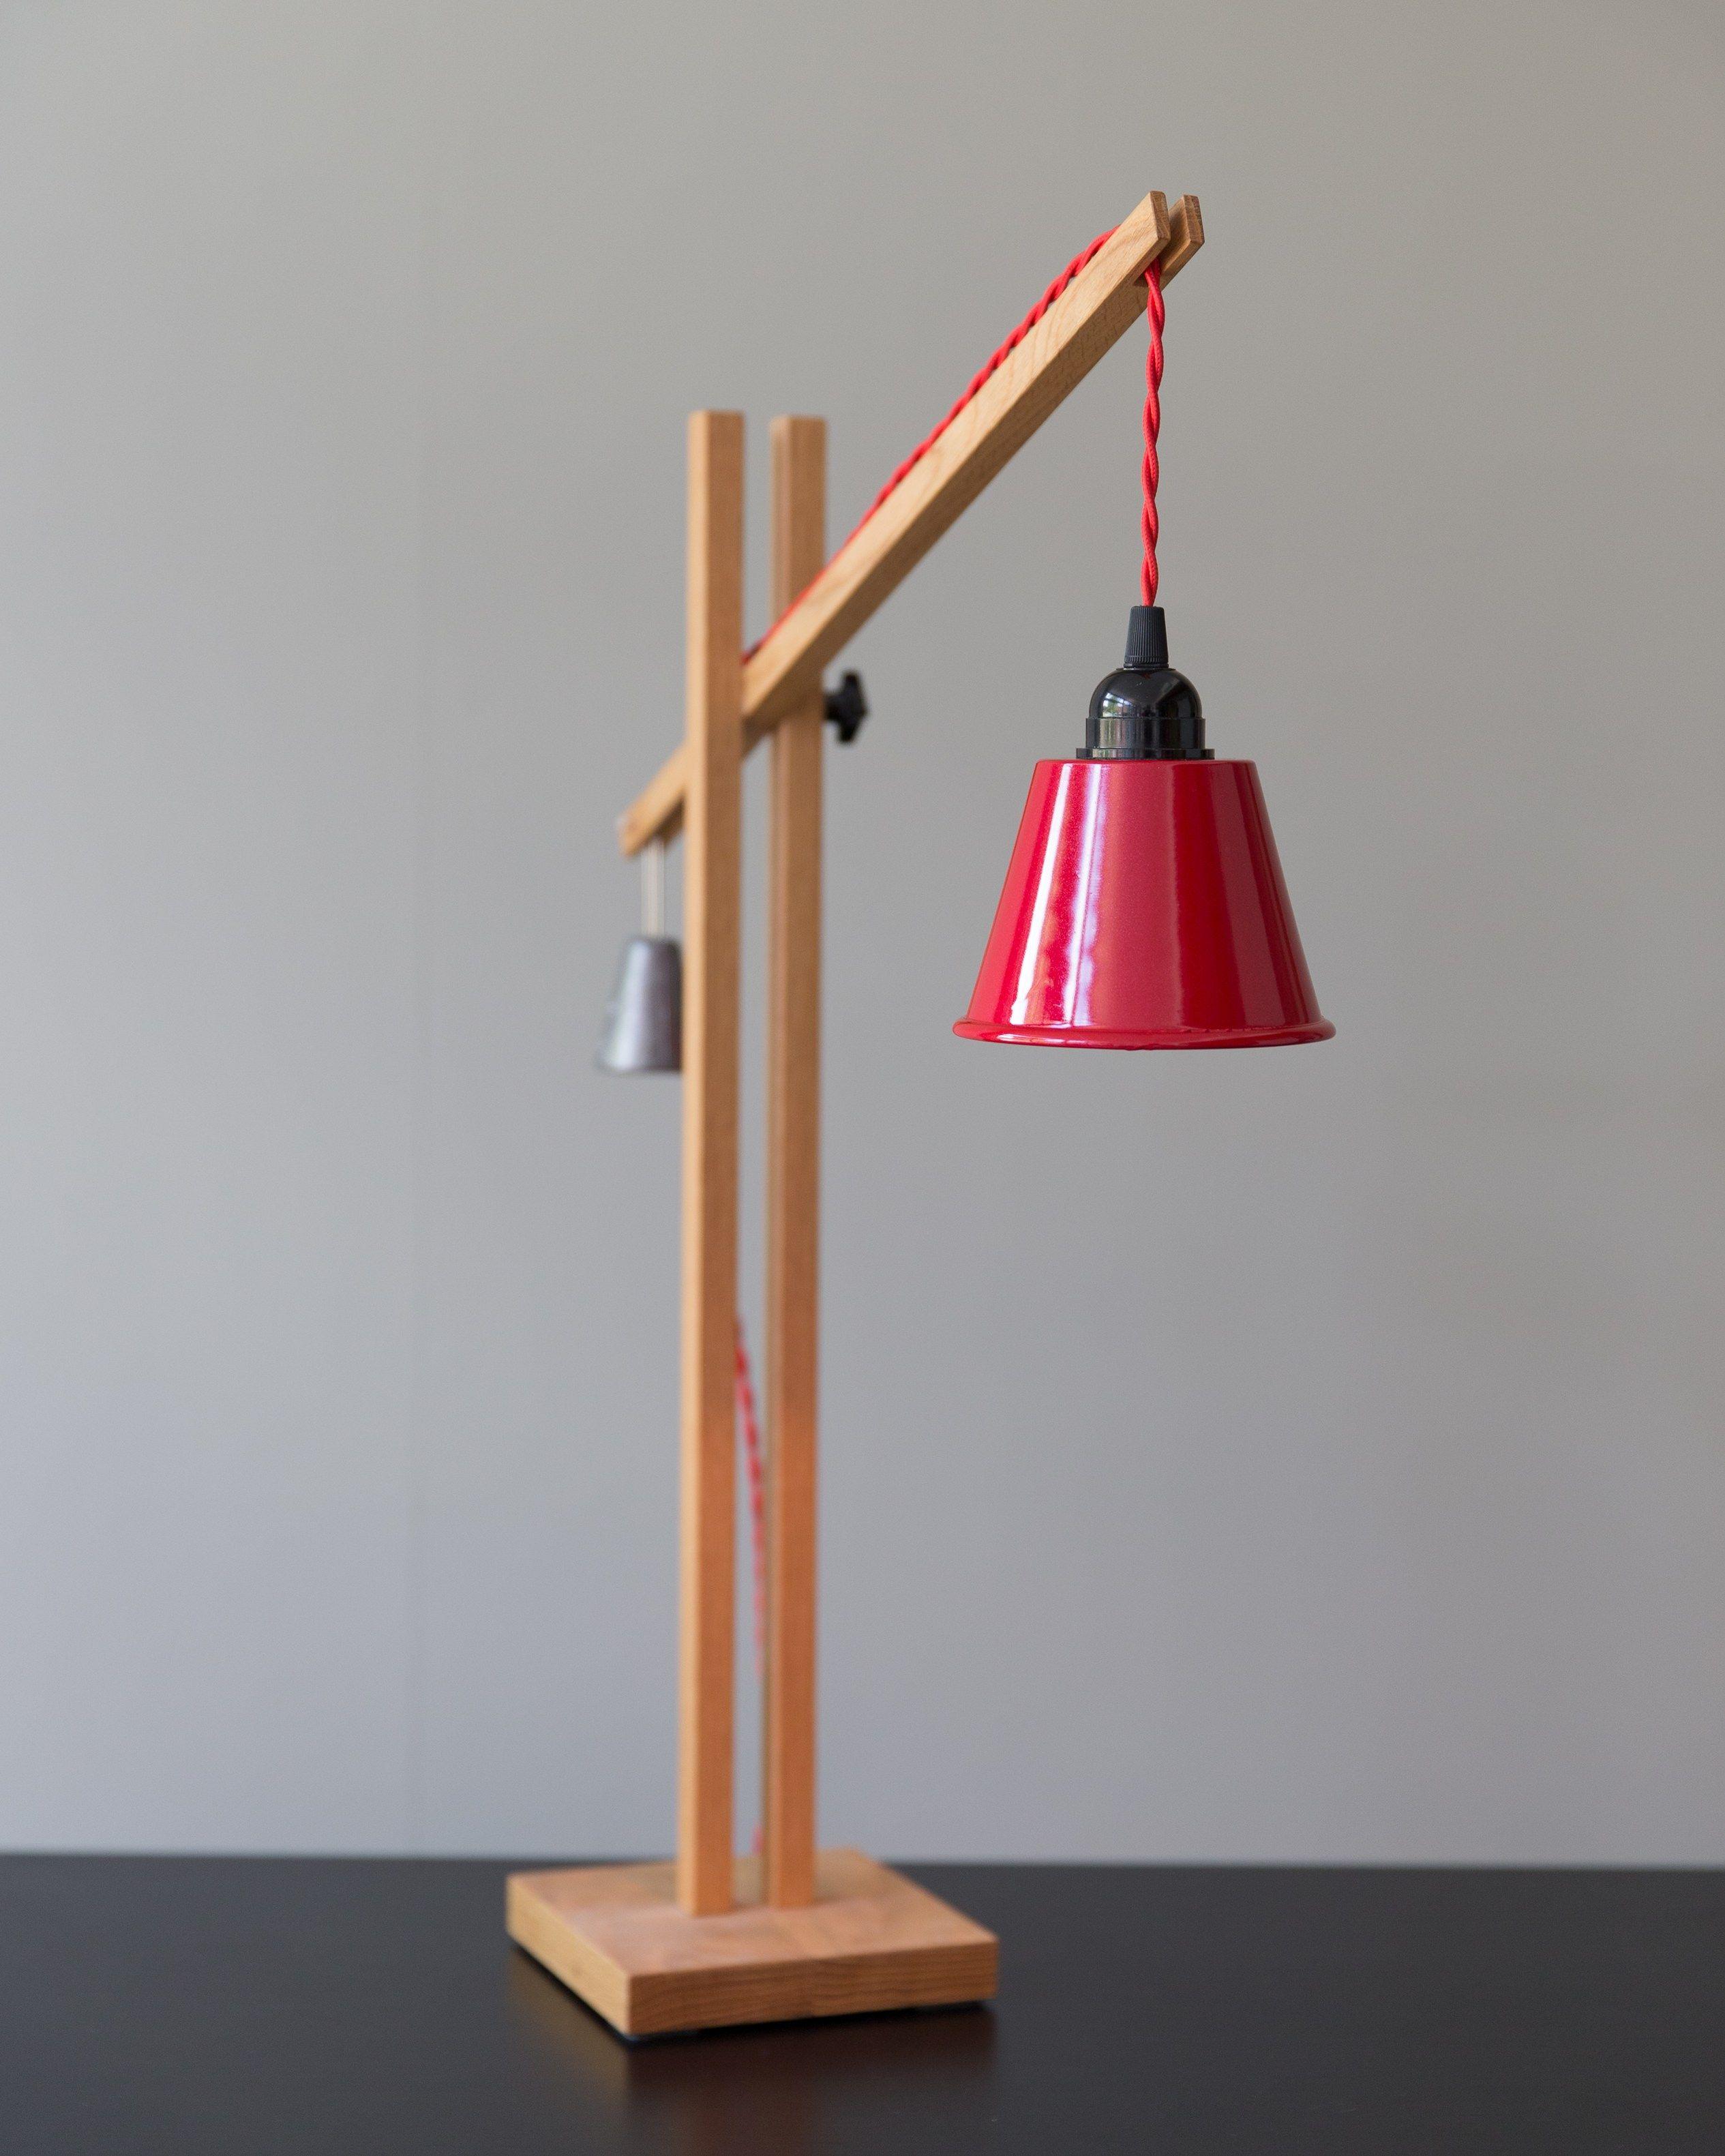 stick lampe de bureau by emko uab design steuart padwick. Black Bedroom Furniture Sets. Home Design Ideas